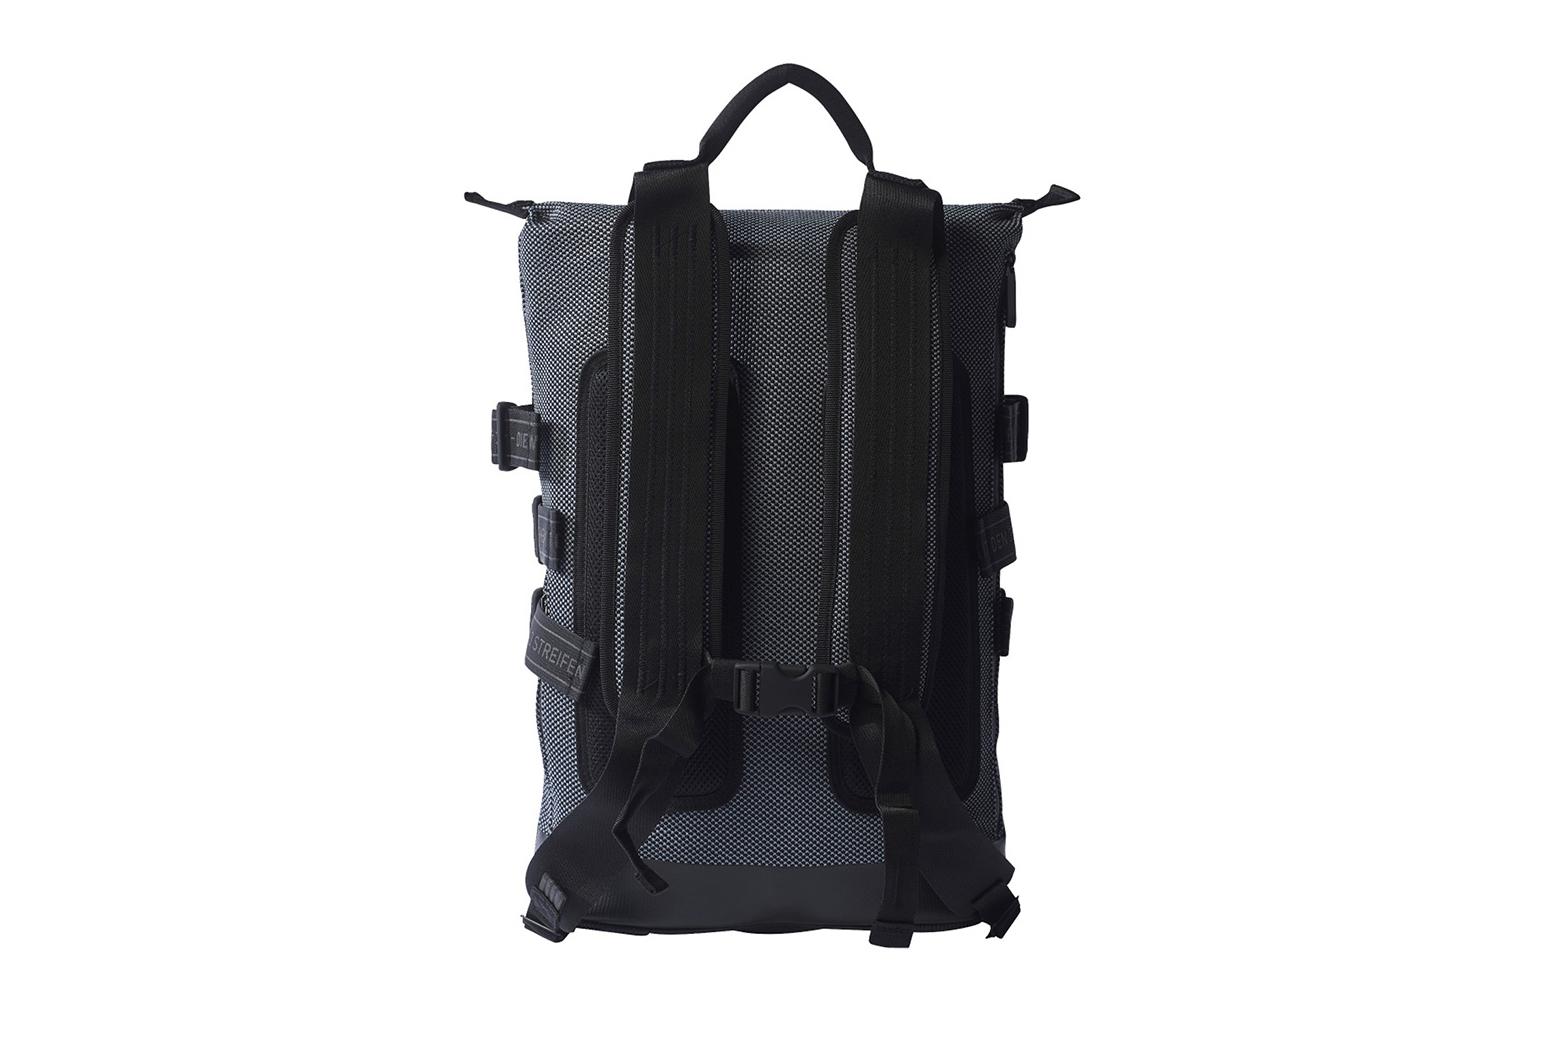 adidas Originals NMD Backpack Primeknit Footwear Three Stripes Germany Accessories Bags - 3746559